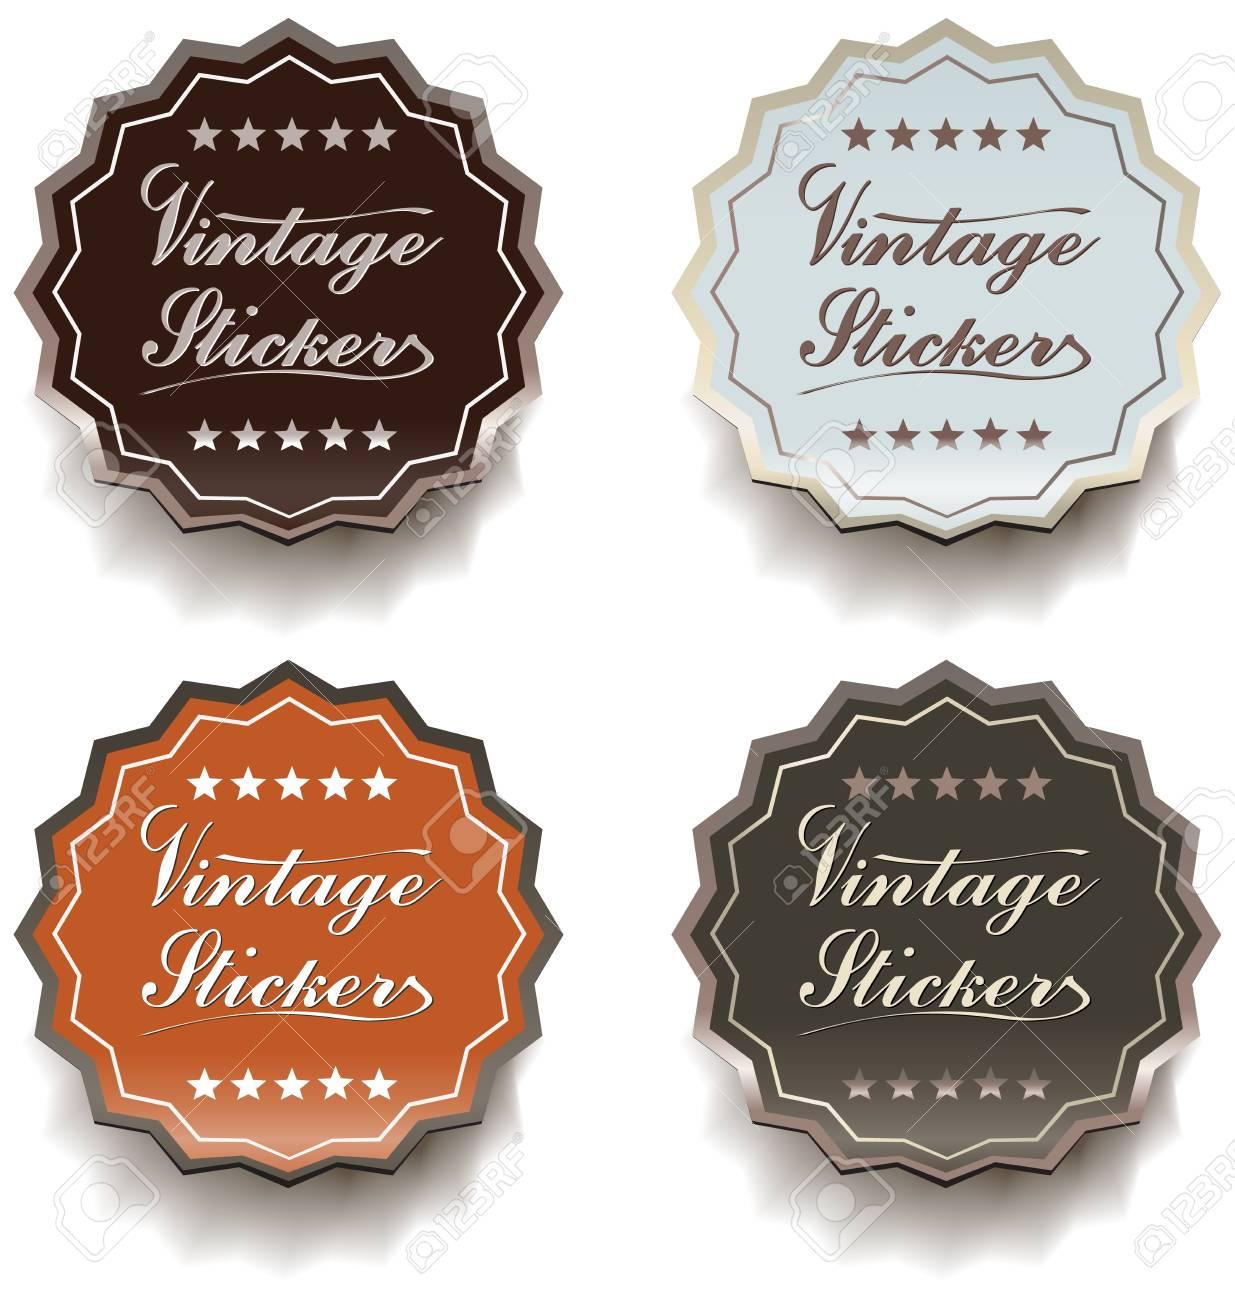 Vintage stickers Stock Vector - 13231936